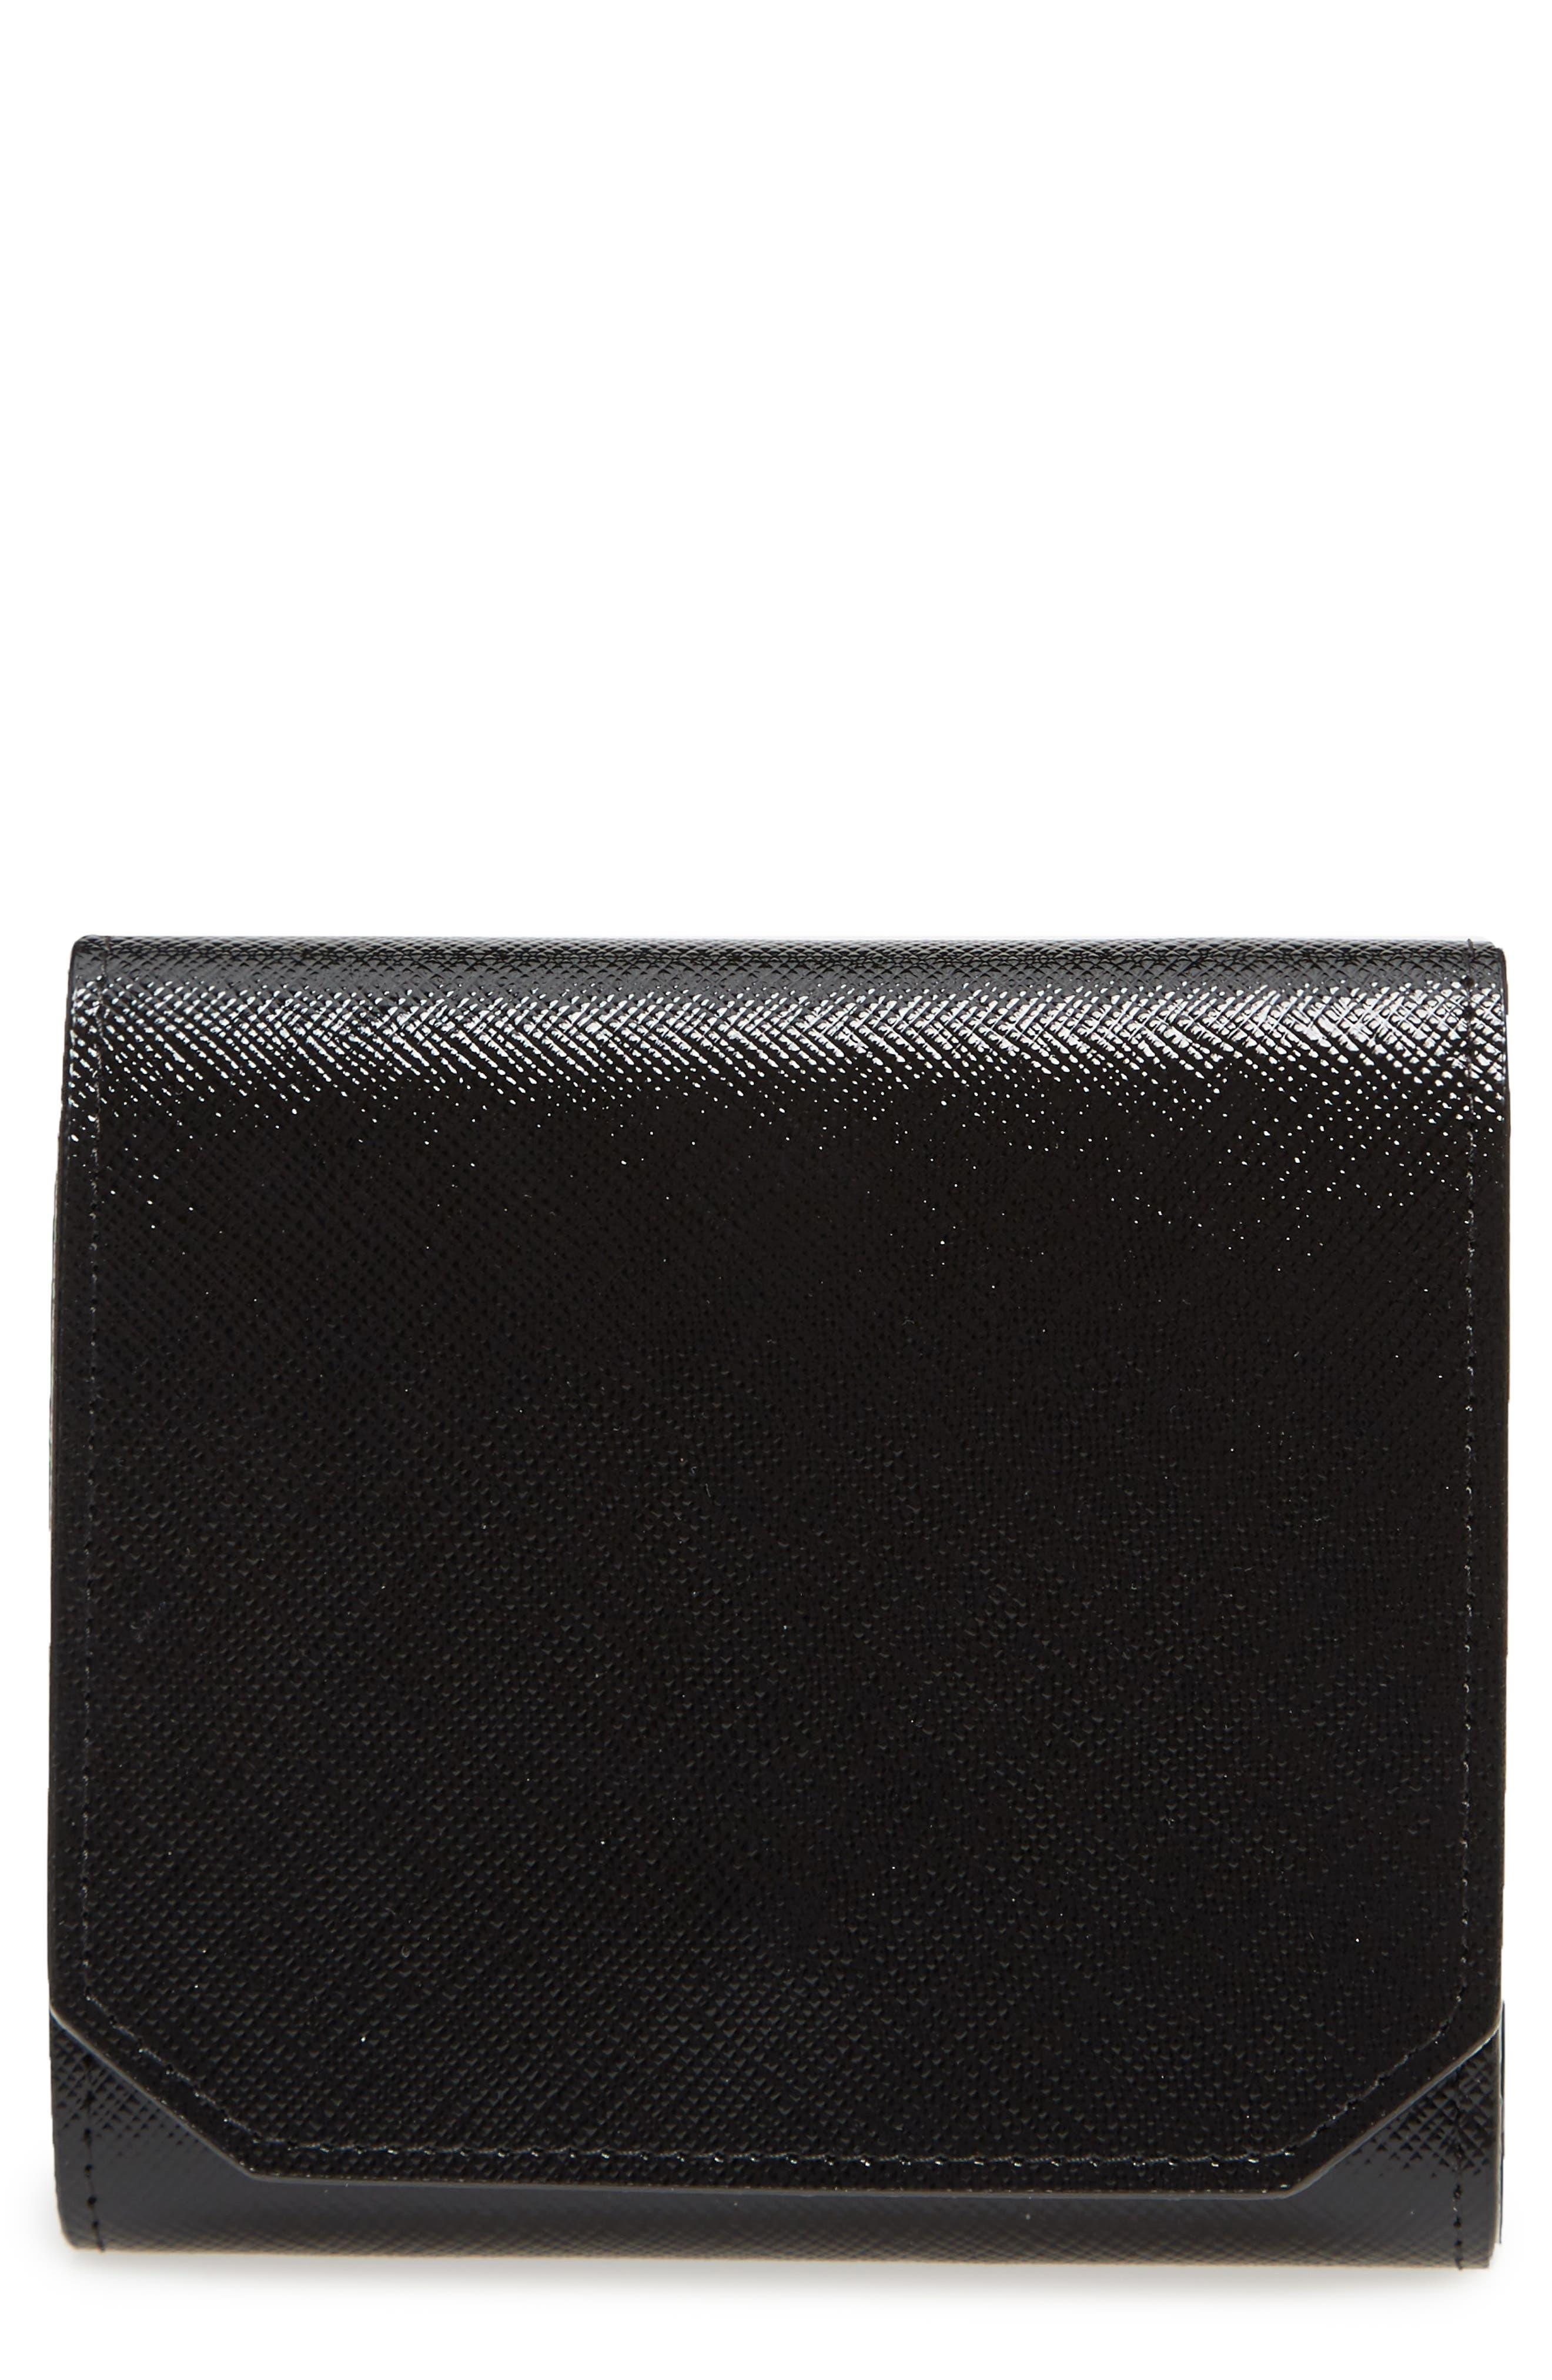 Trifold Leather Envelope Wallet,                             Main thumbnail 1, color,                             001